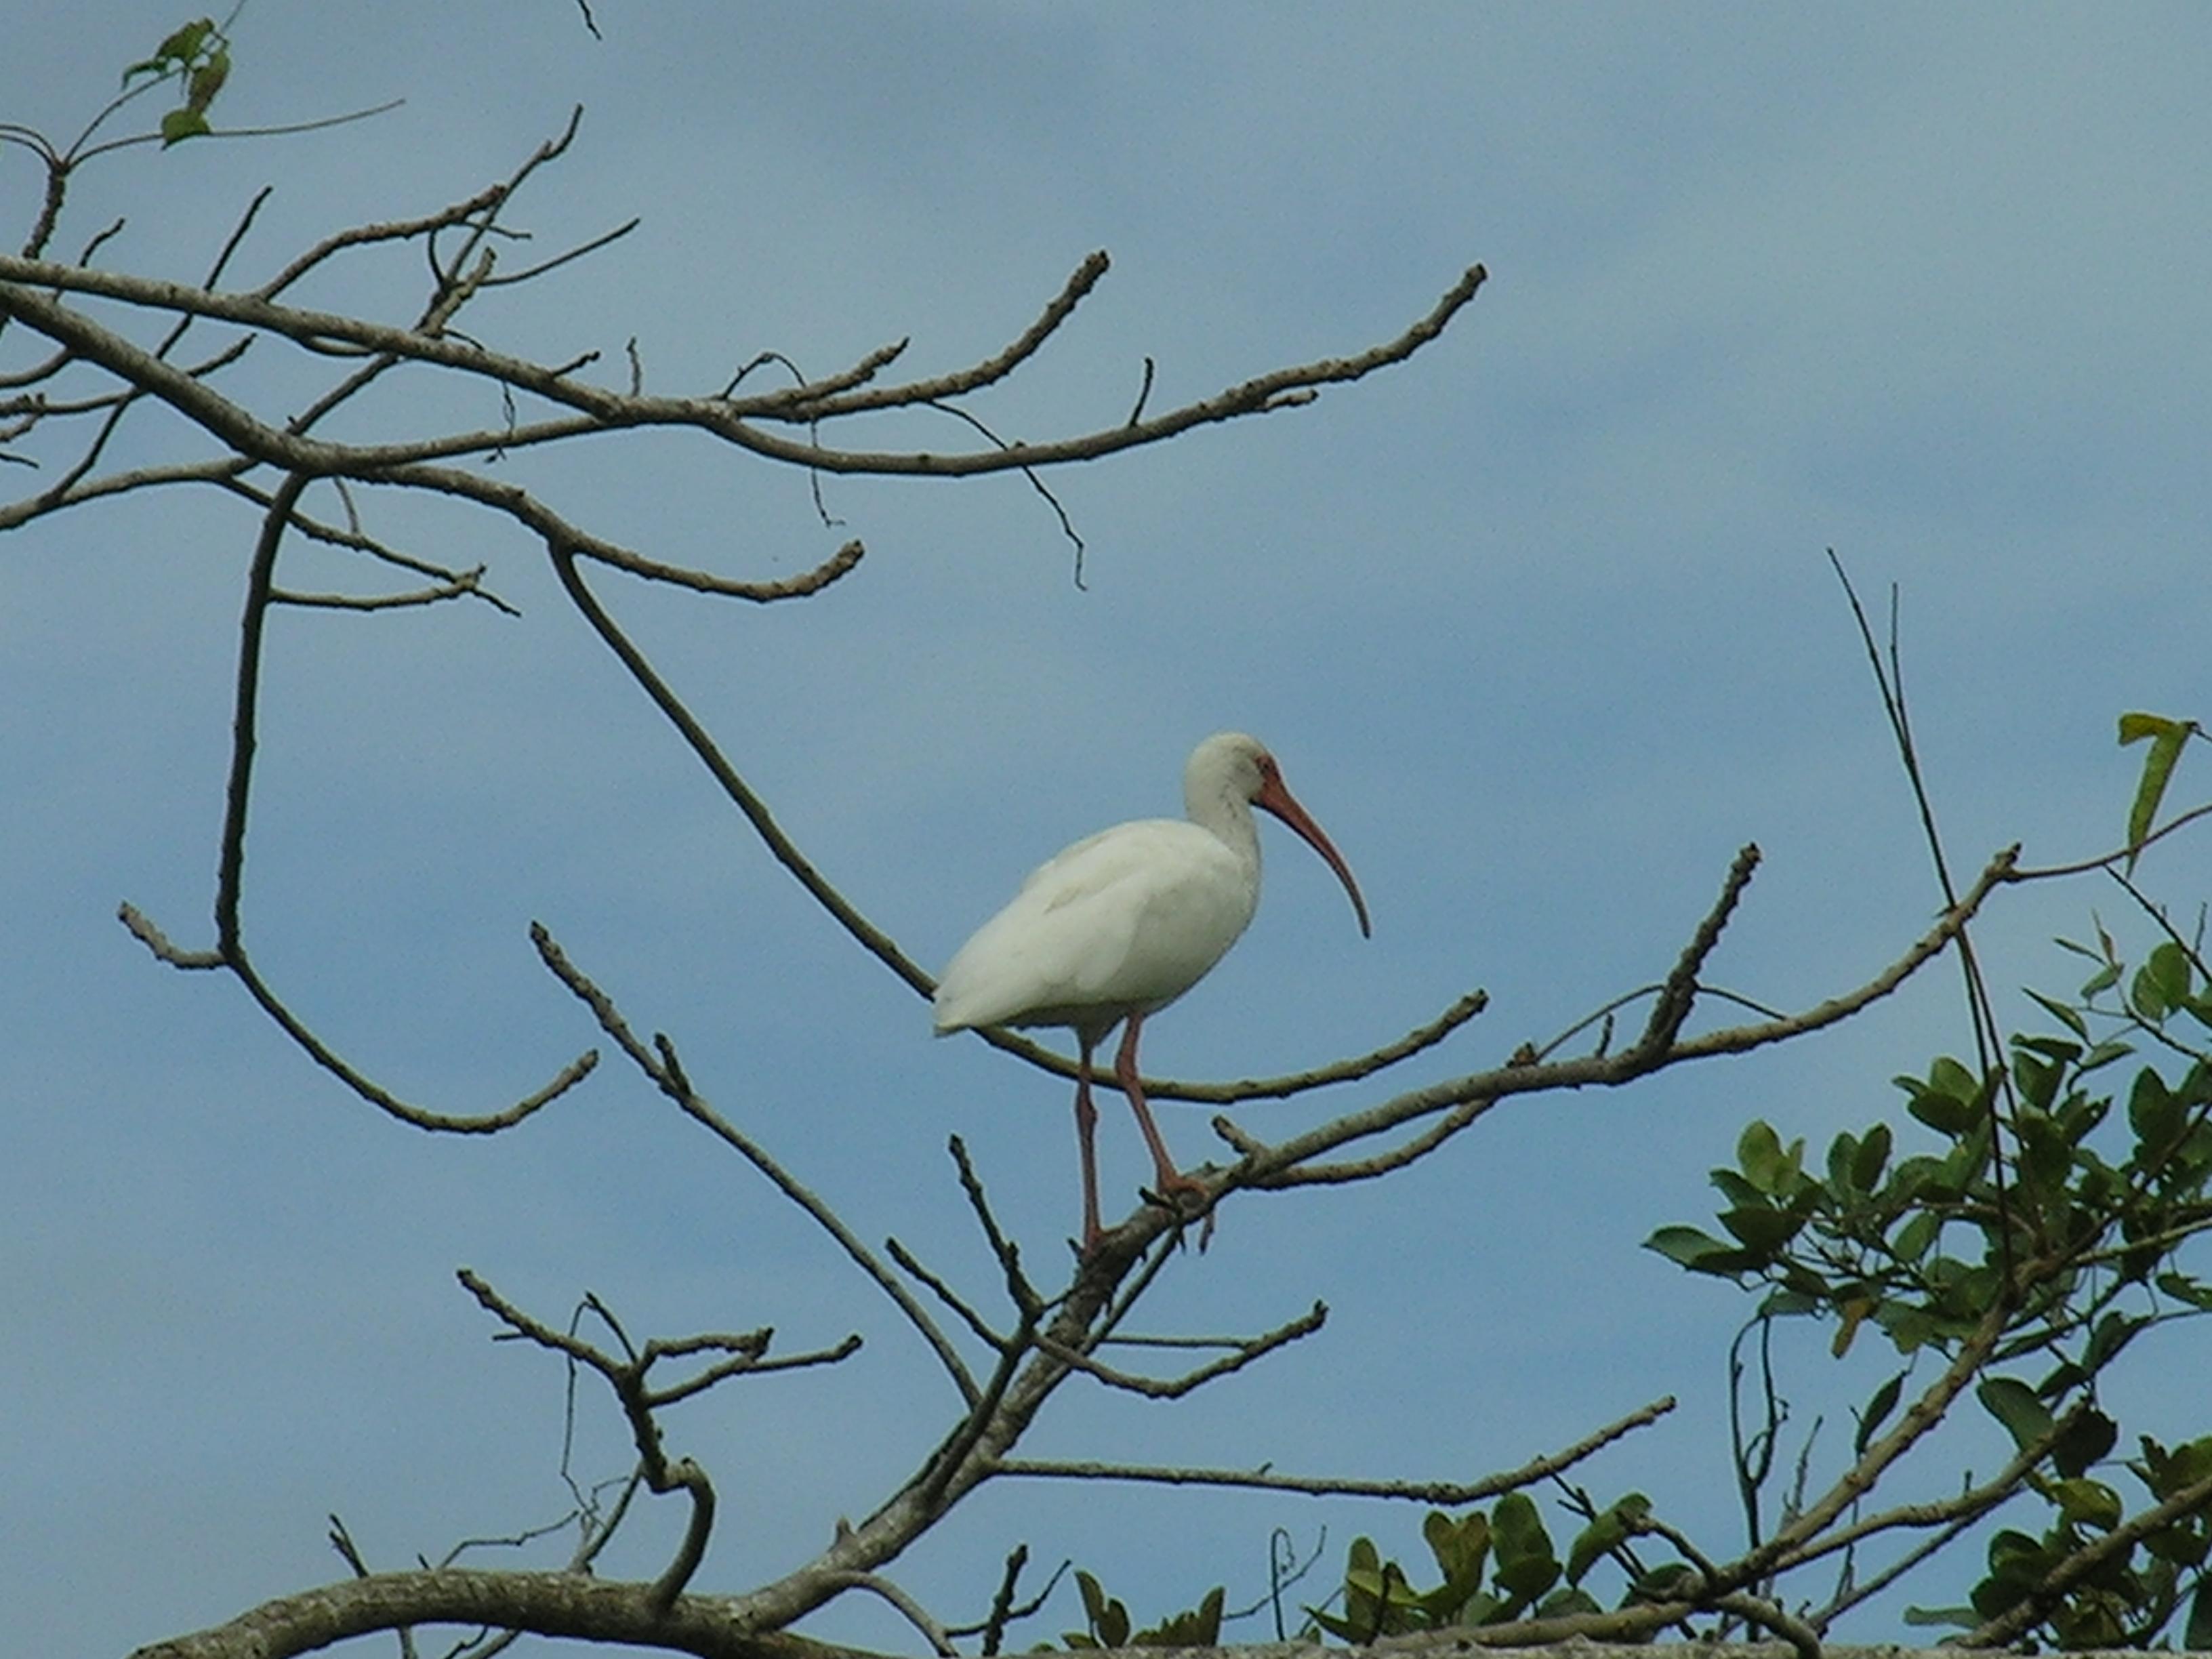 White birt in Nicaragua